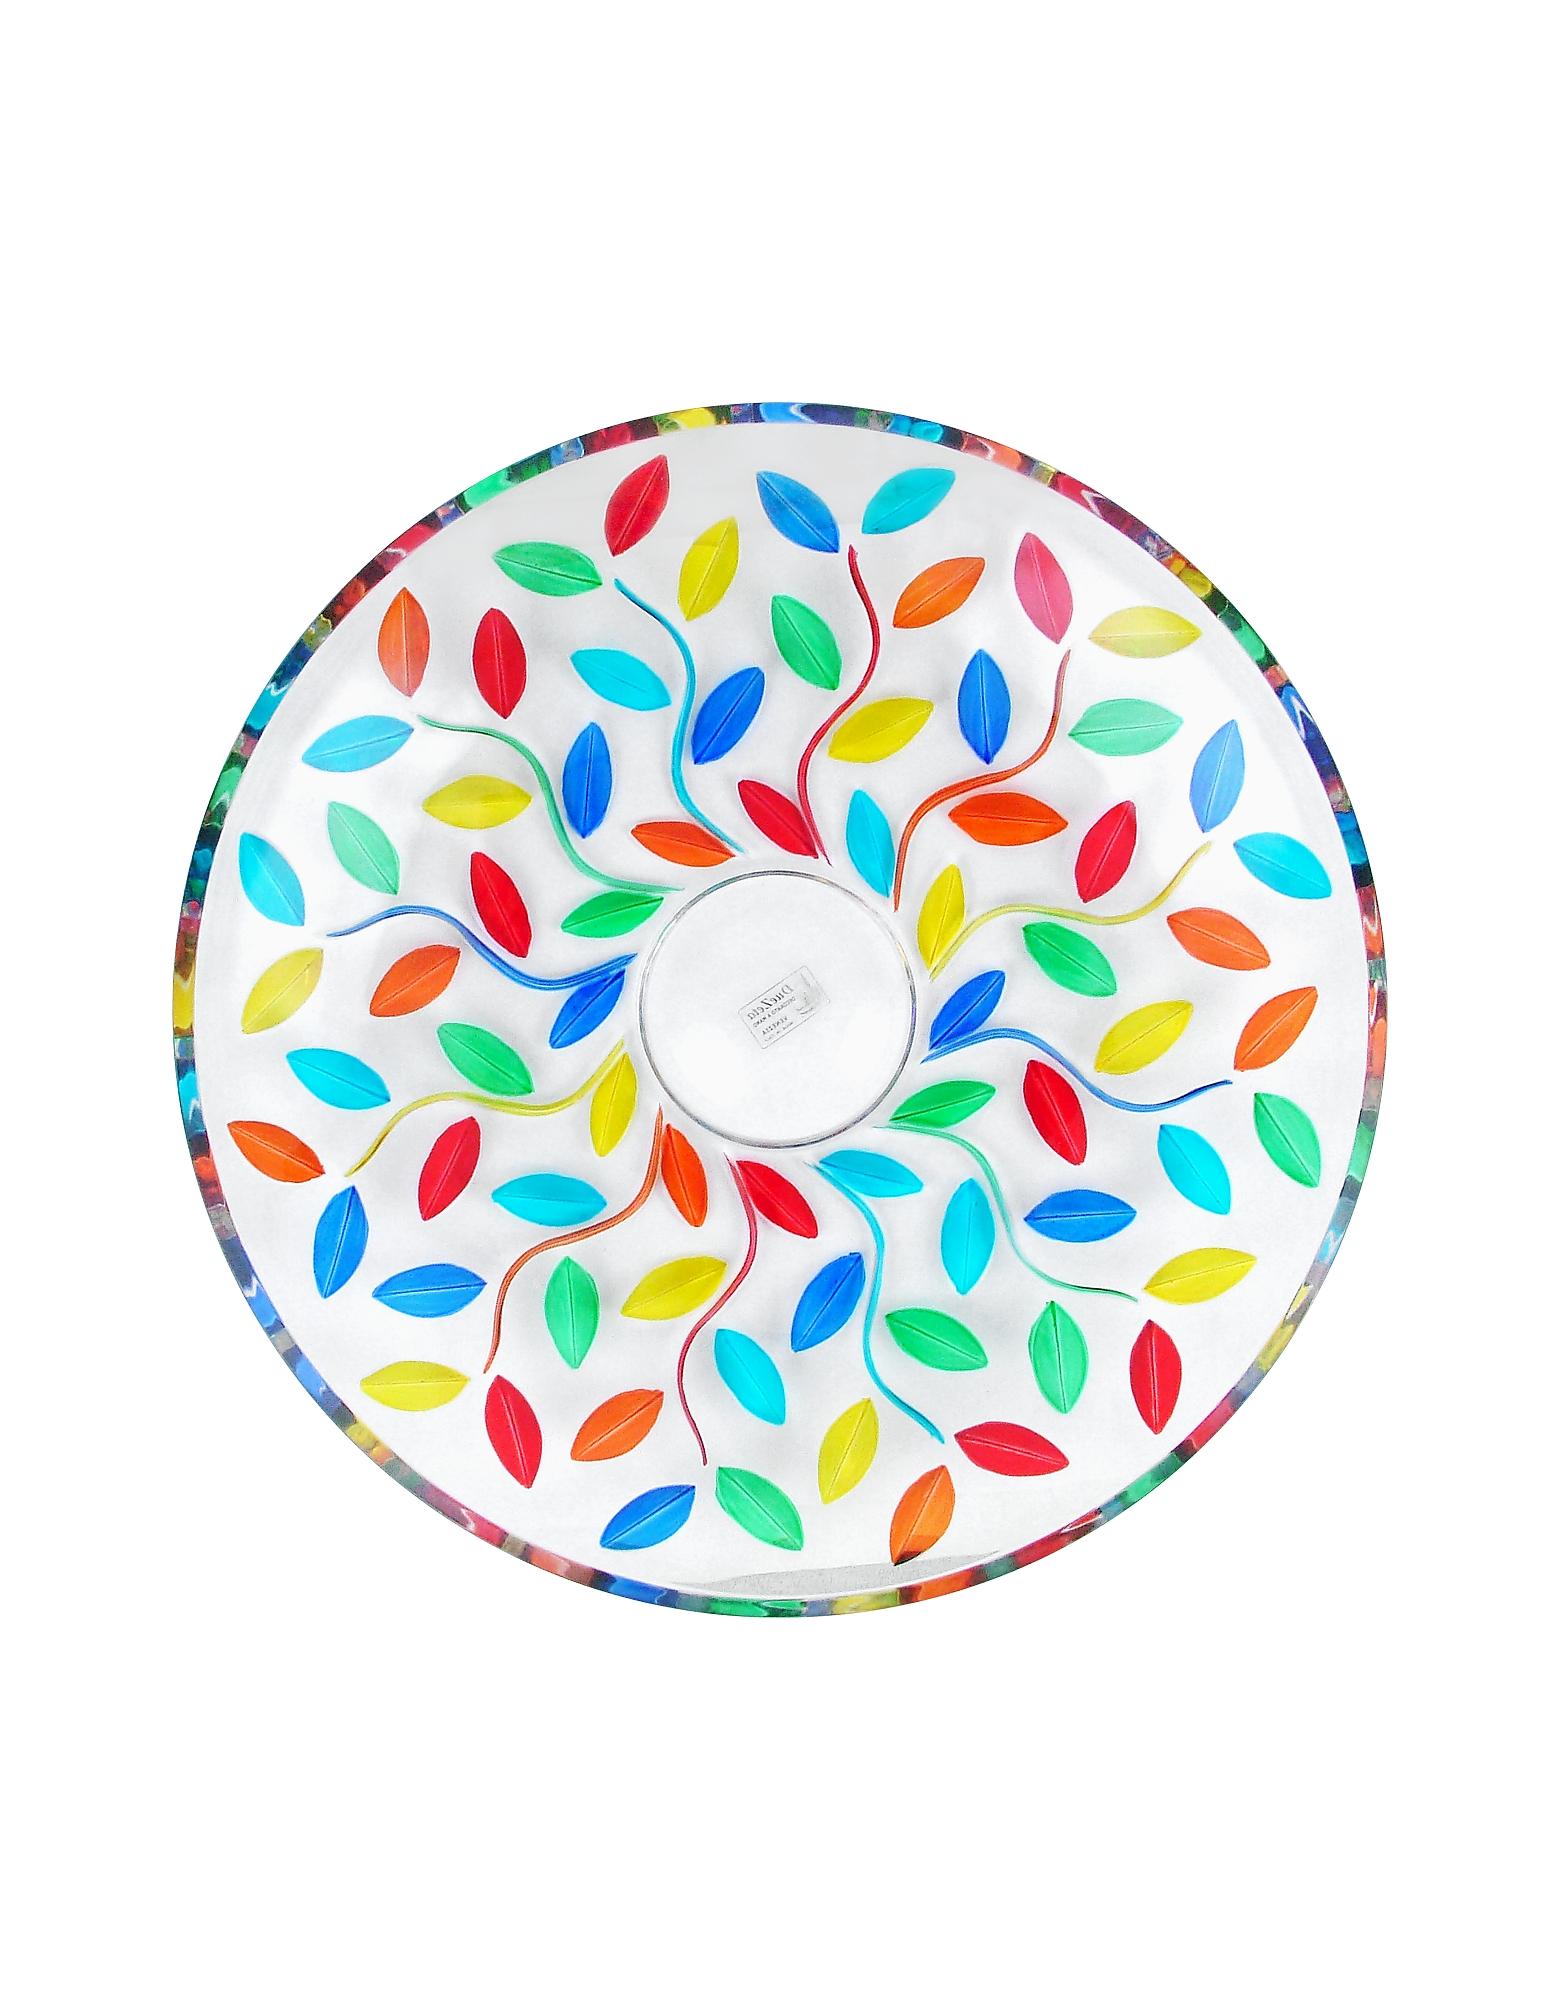 Doge - Hand Decorated Murano Glass Centerpiece Bowl от Forzieri.com INT